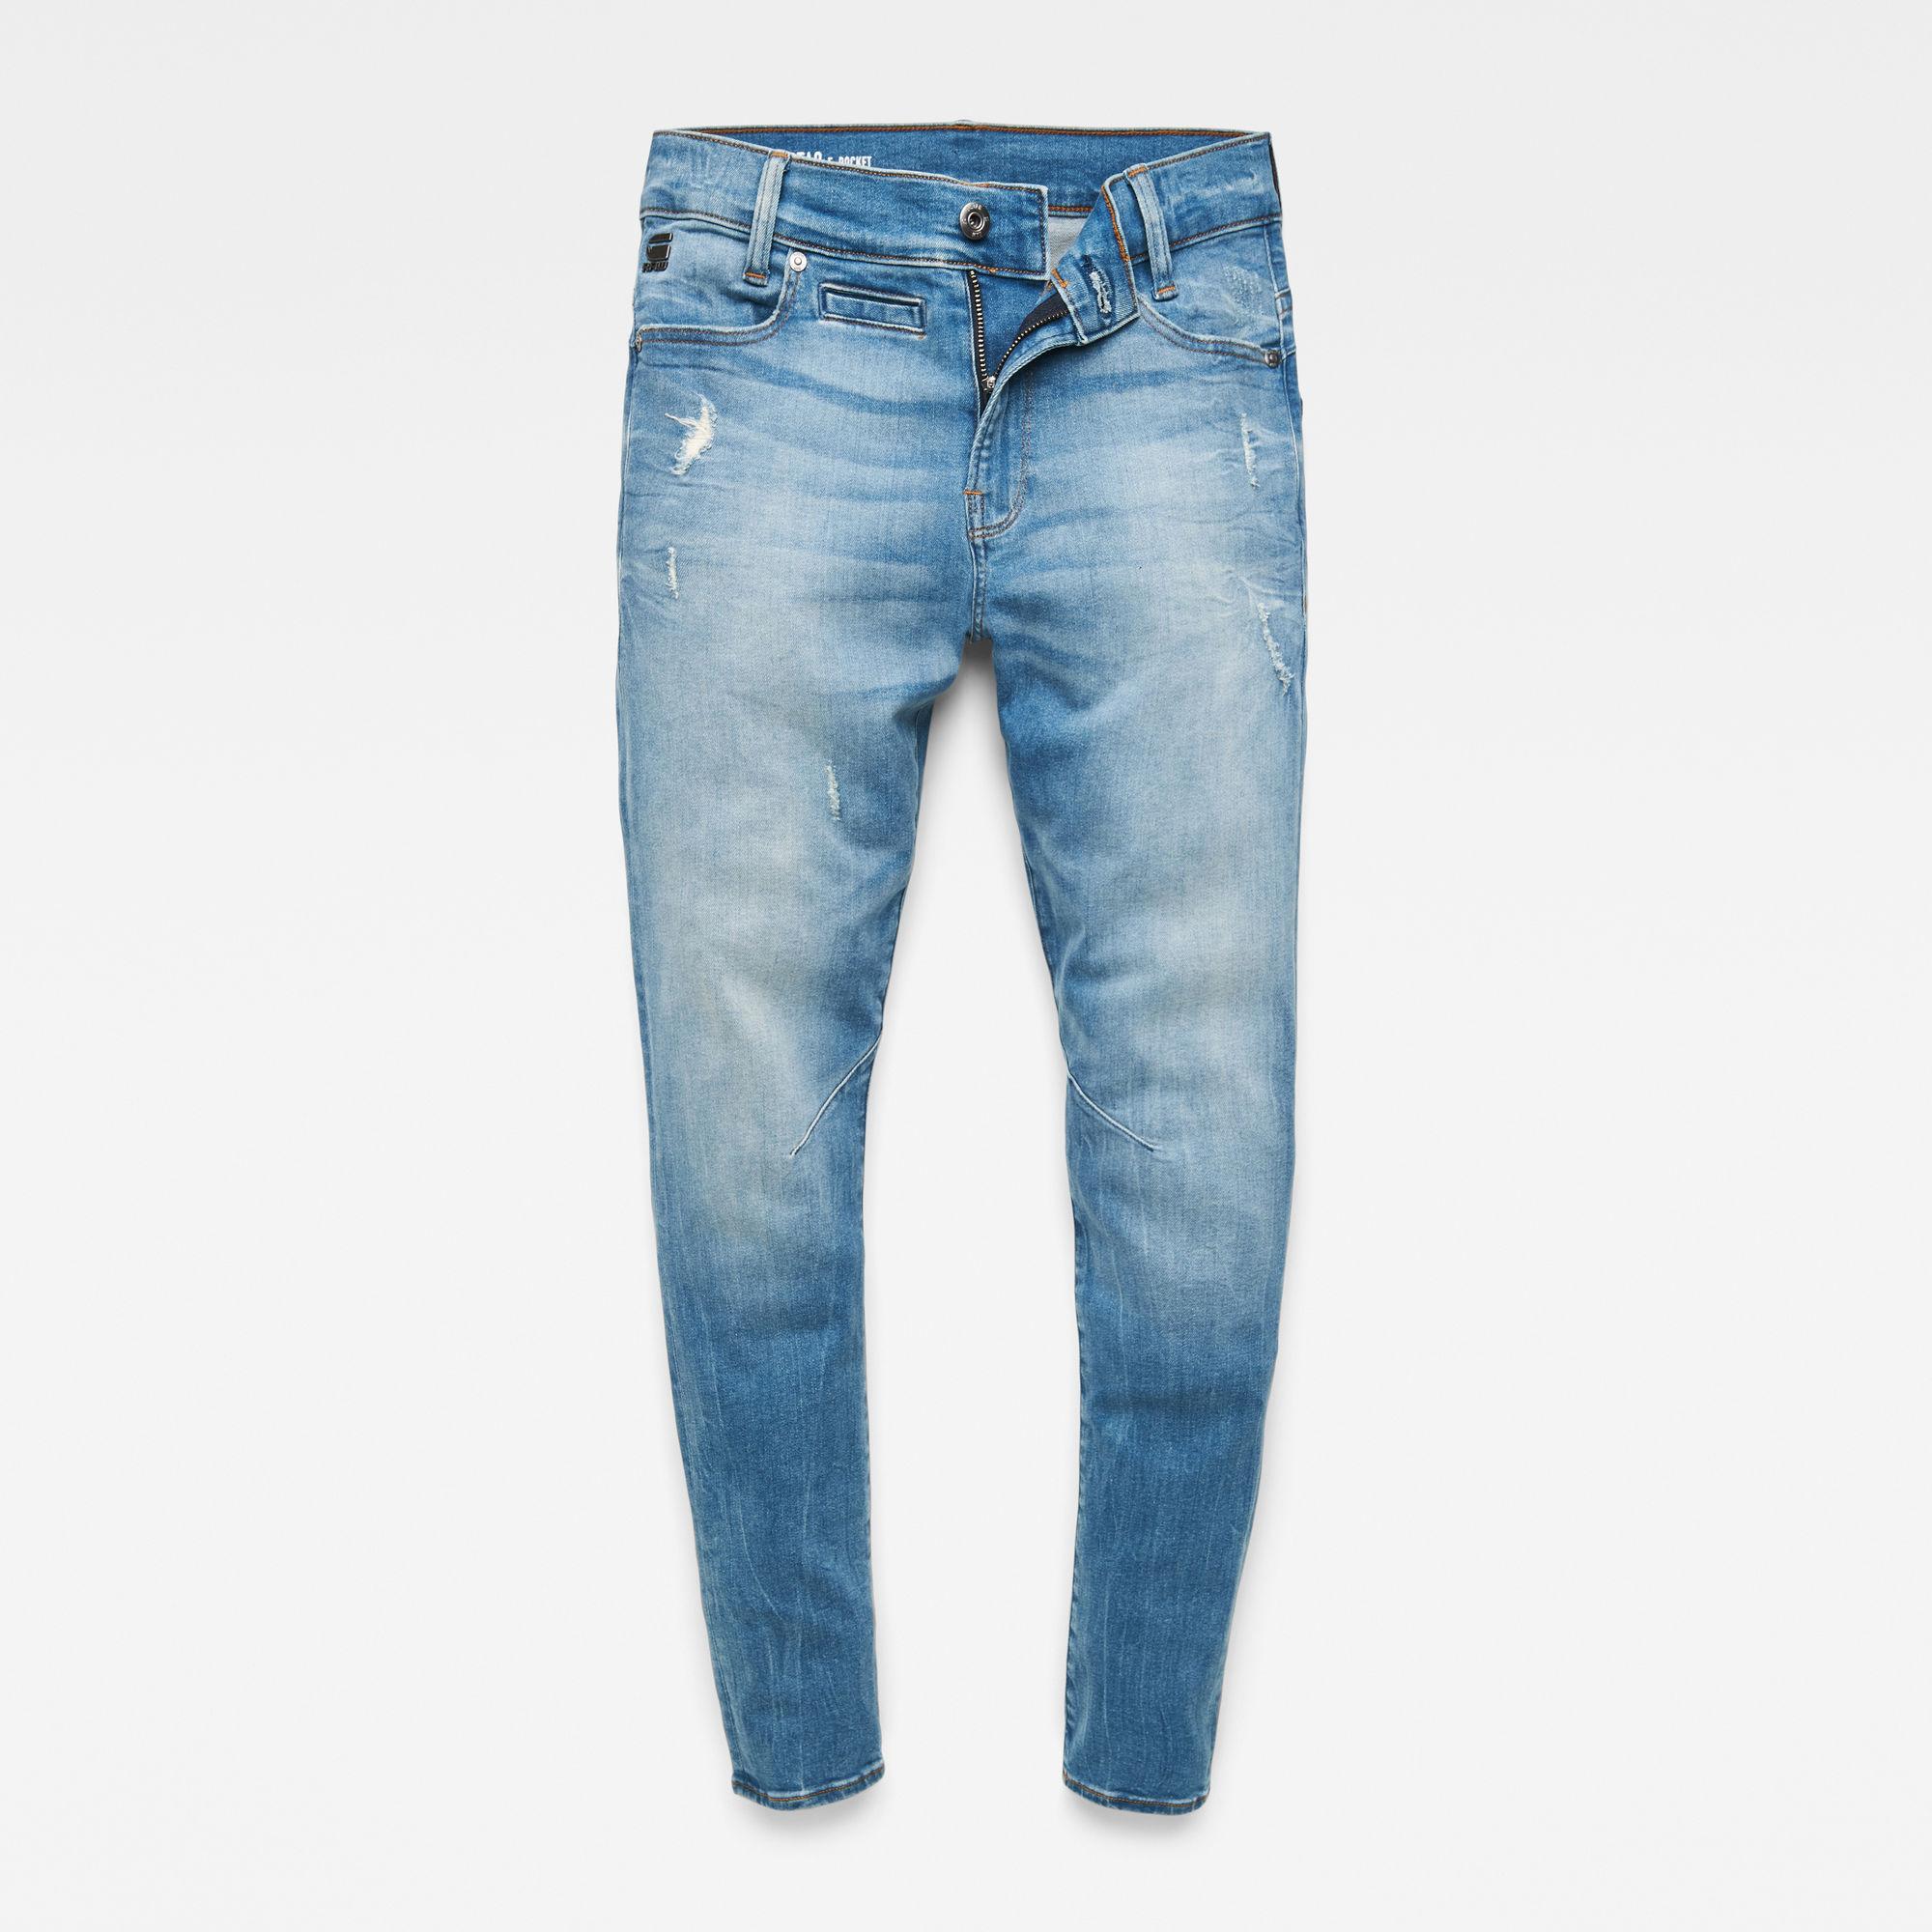 G-Star RAW Jongens D-Staq Tapered jeans Lichtblauw